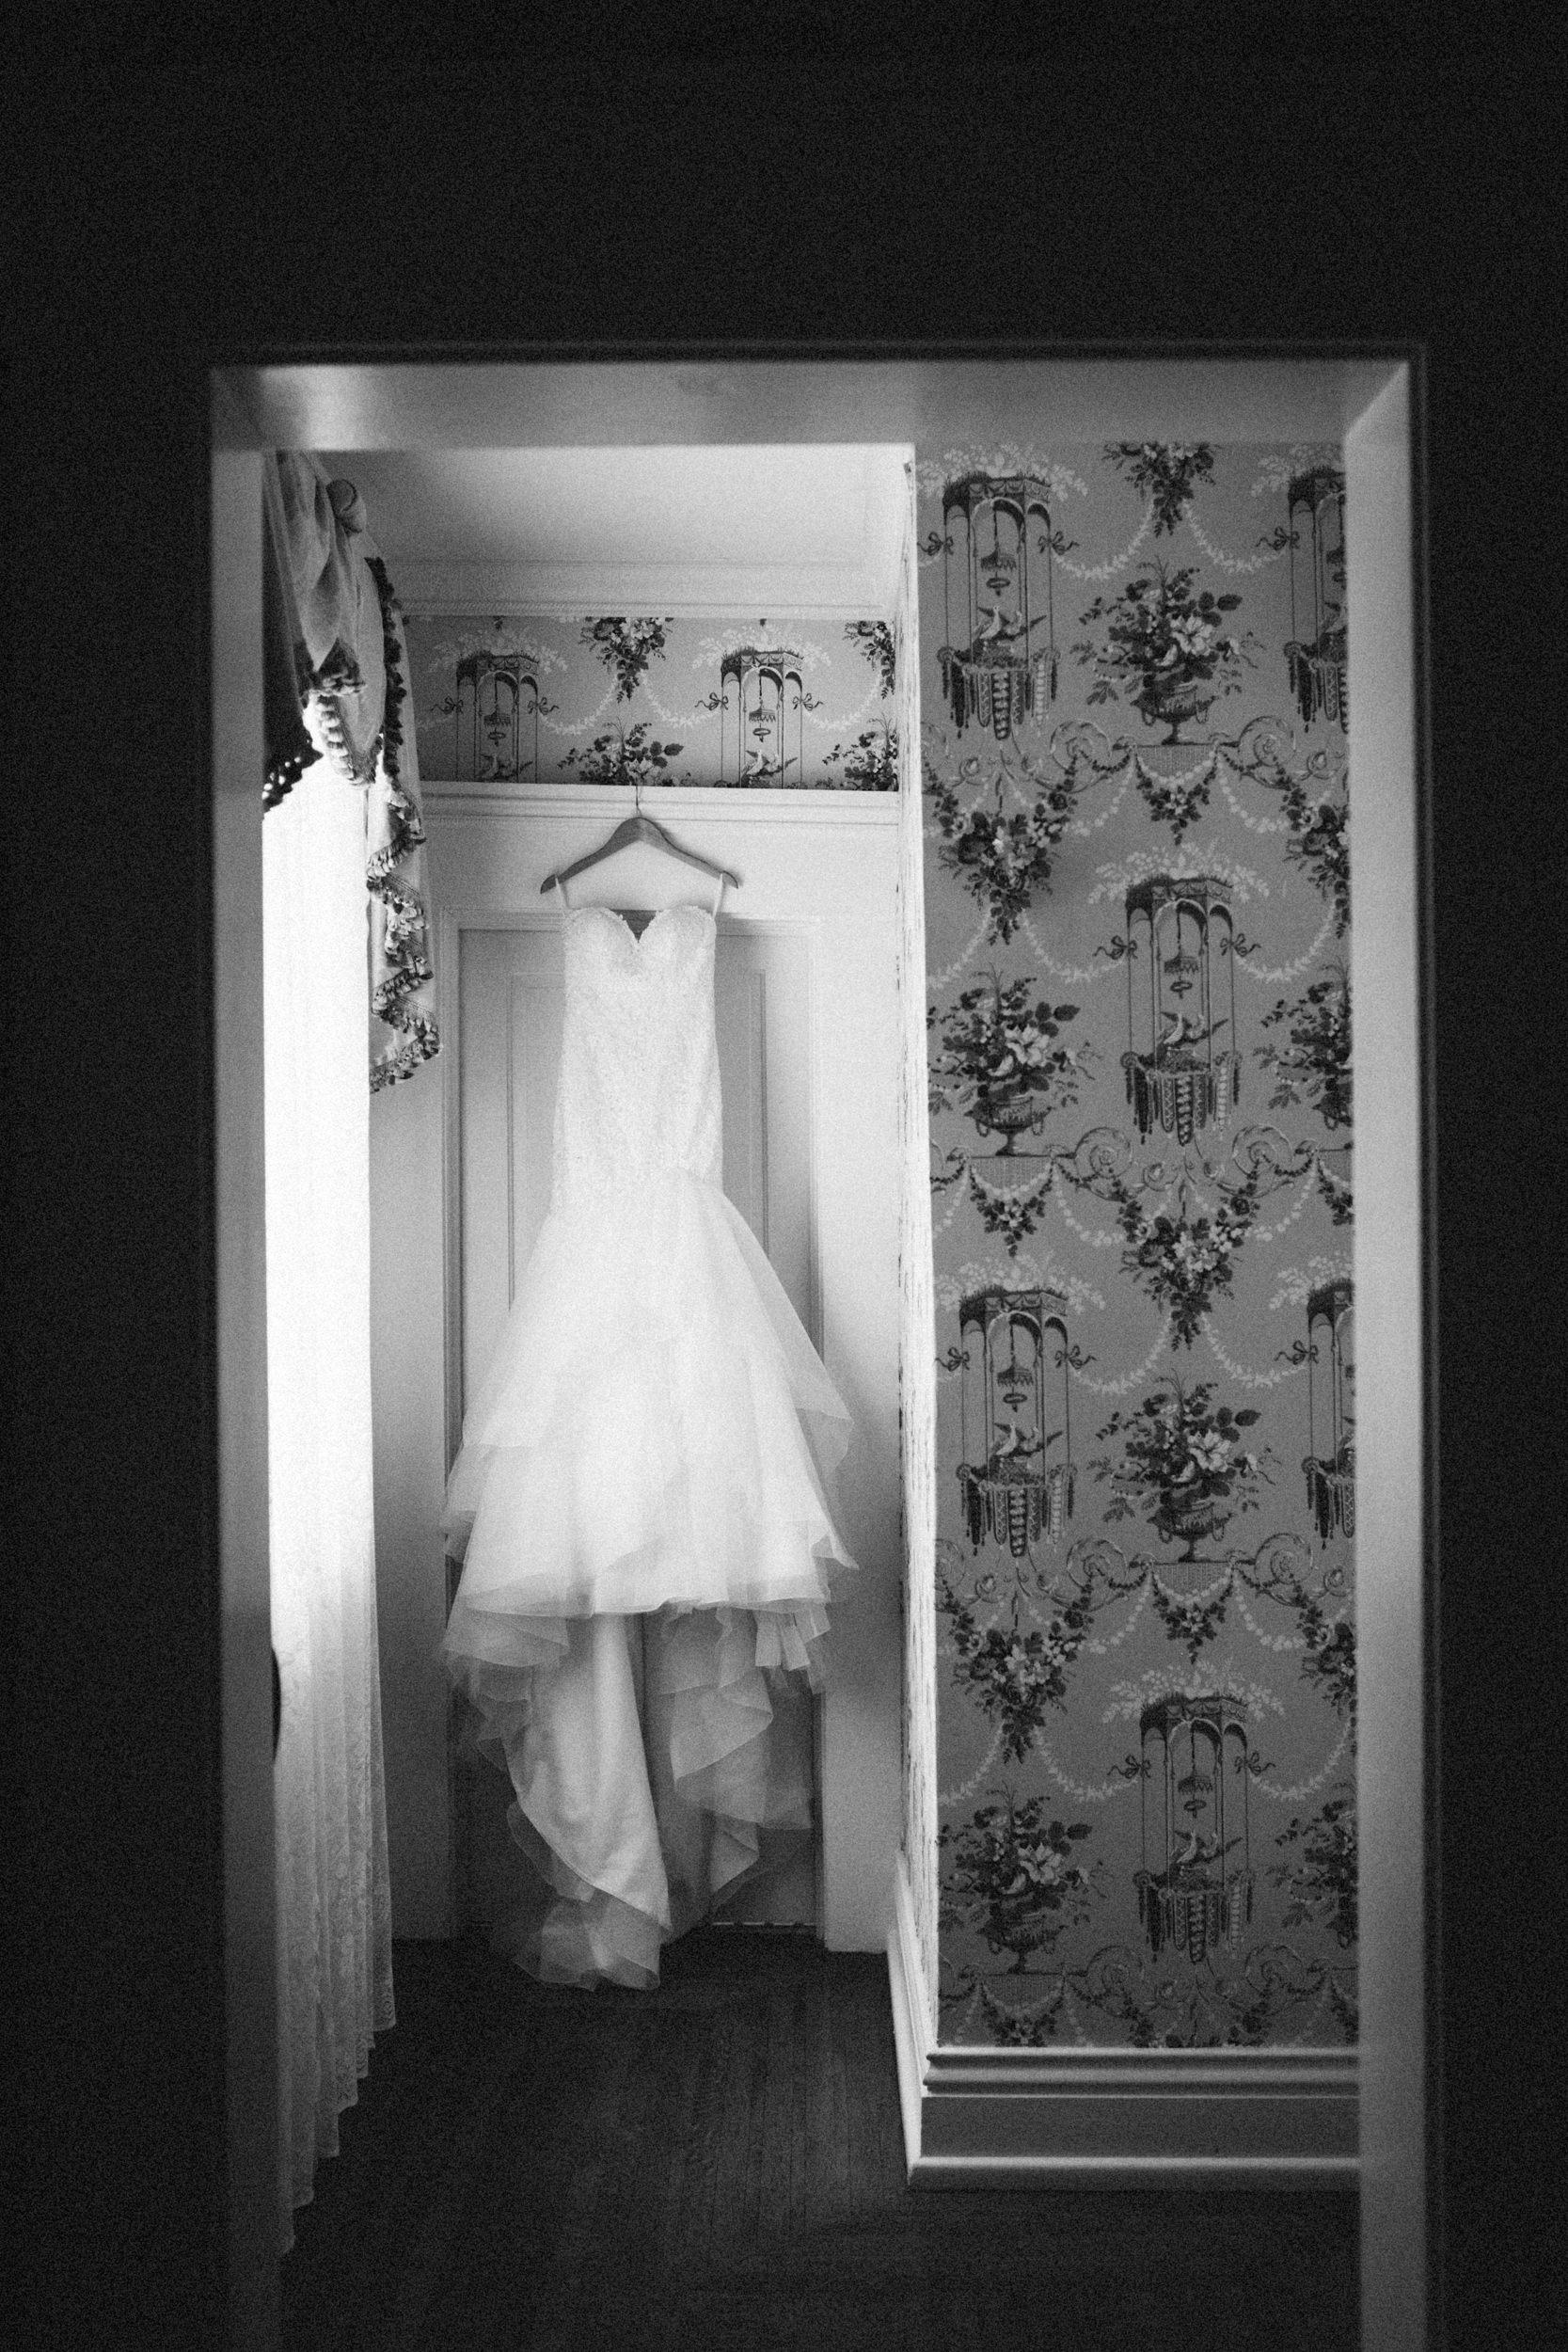 Louisville-Kentucky-Wedding-Elopement-Photographer-Sarah-Katherine-Davis-Photography-Whitehall-Classic-Timeless-Garden-Wedding-2.jpg